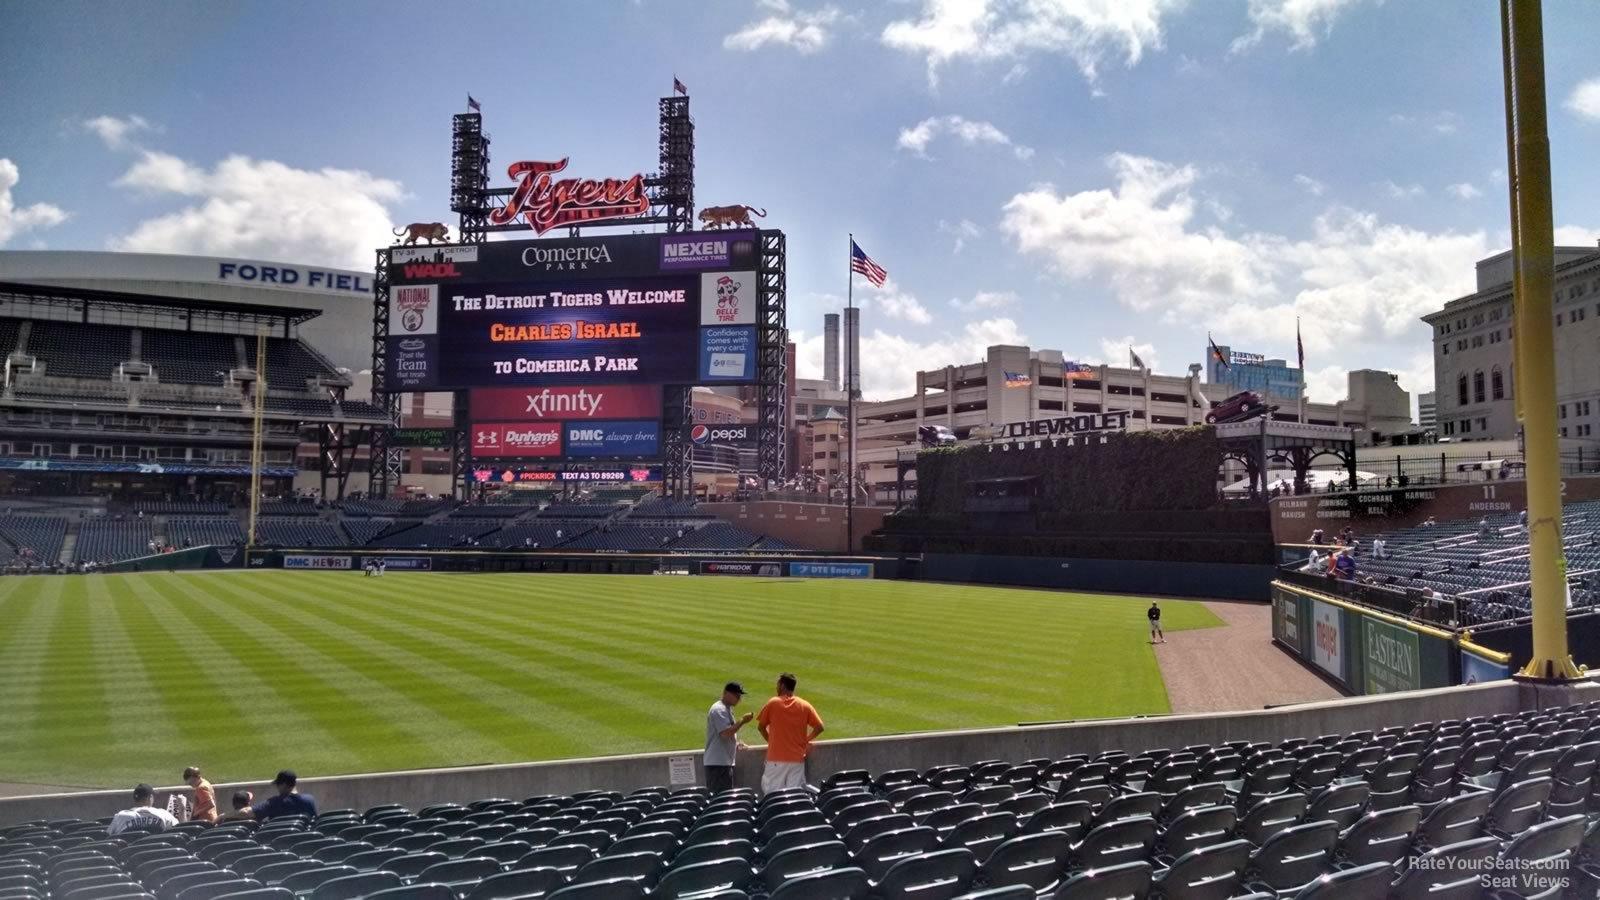 Comerica Park Section 113 - Detroit Tigers - RateYourSeats.com